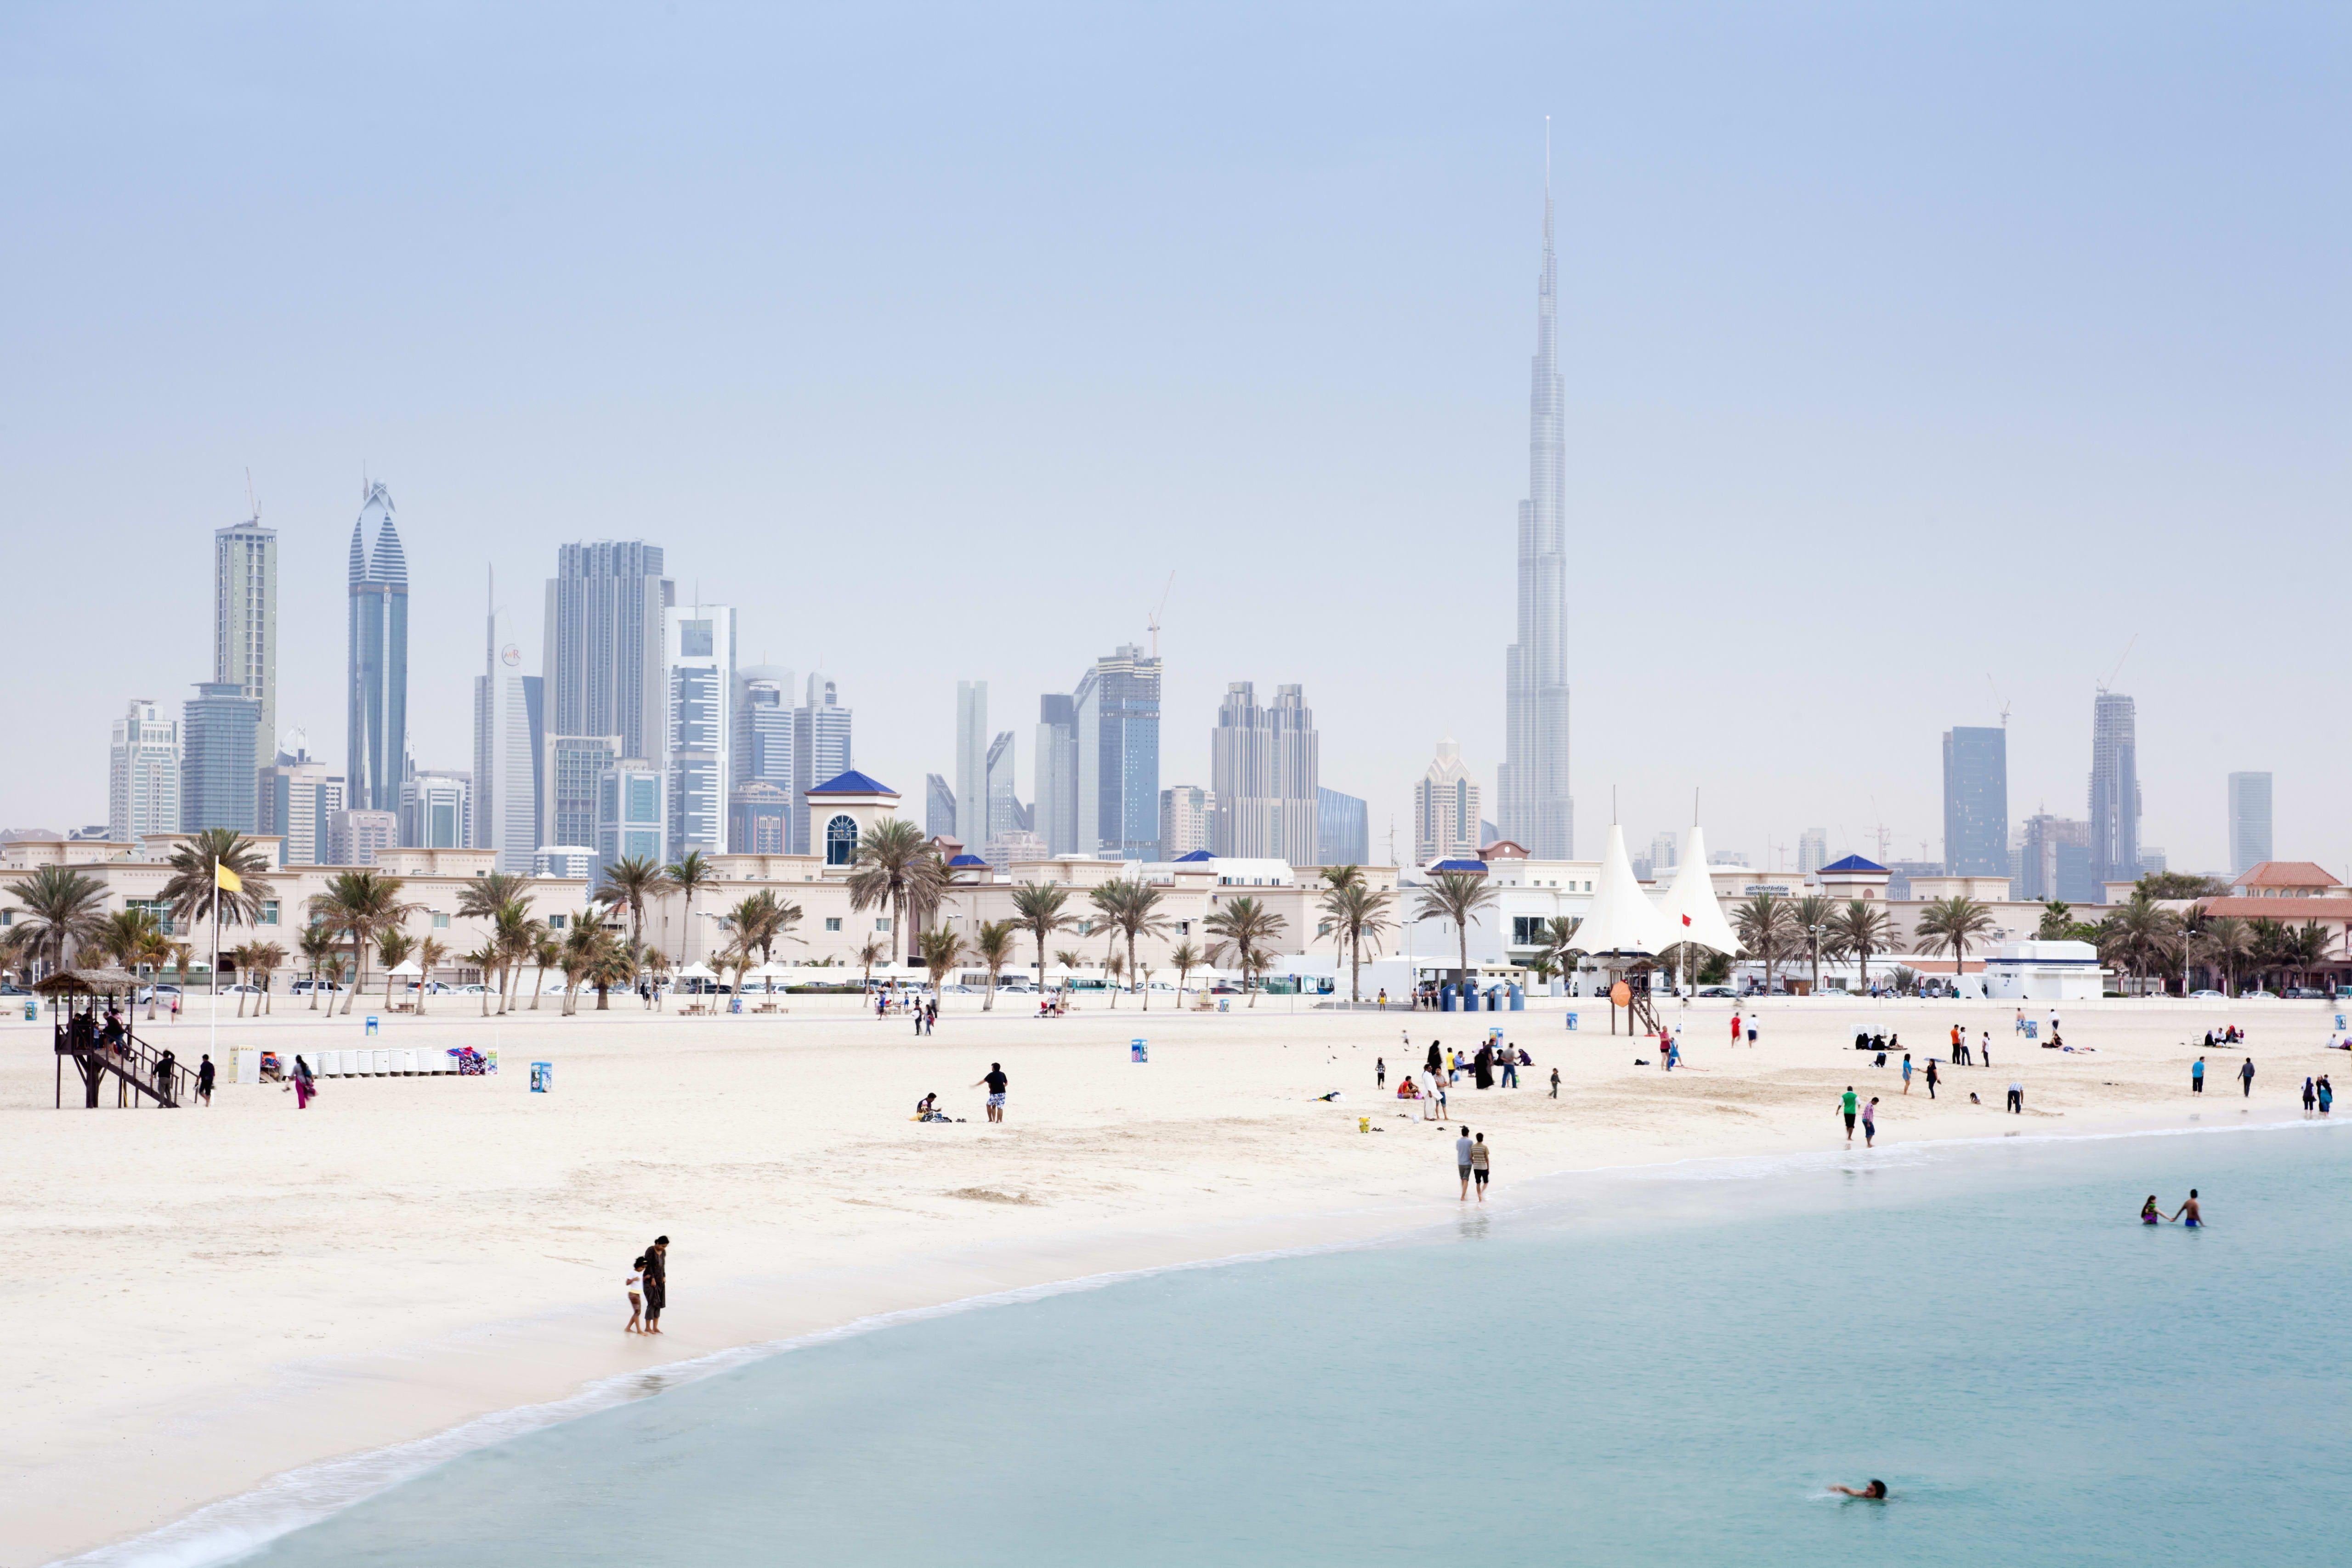 Property Magnate Warns Greed Will Lead To Disaster For Dubai S Housing Market Realestate Feedly Visit Dubai Dubai Travel Guide Dubai Travel